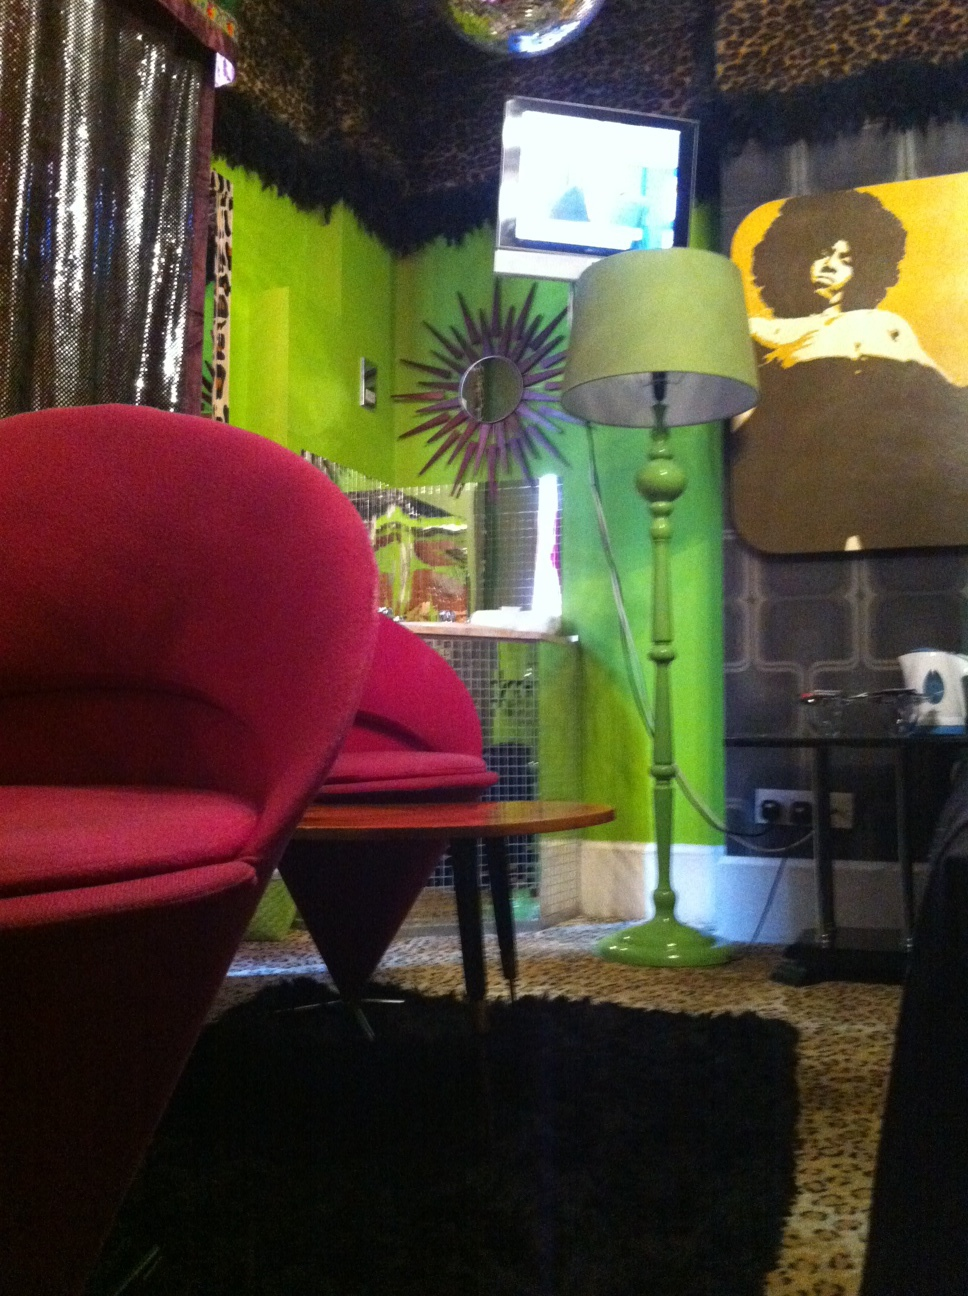 The Funkiest Hotel Room in London